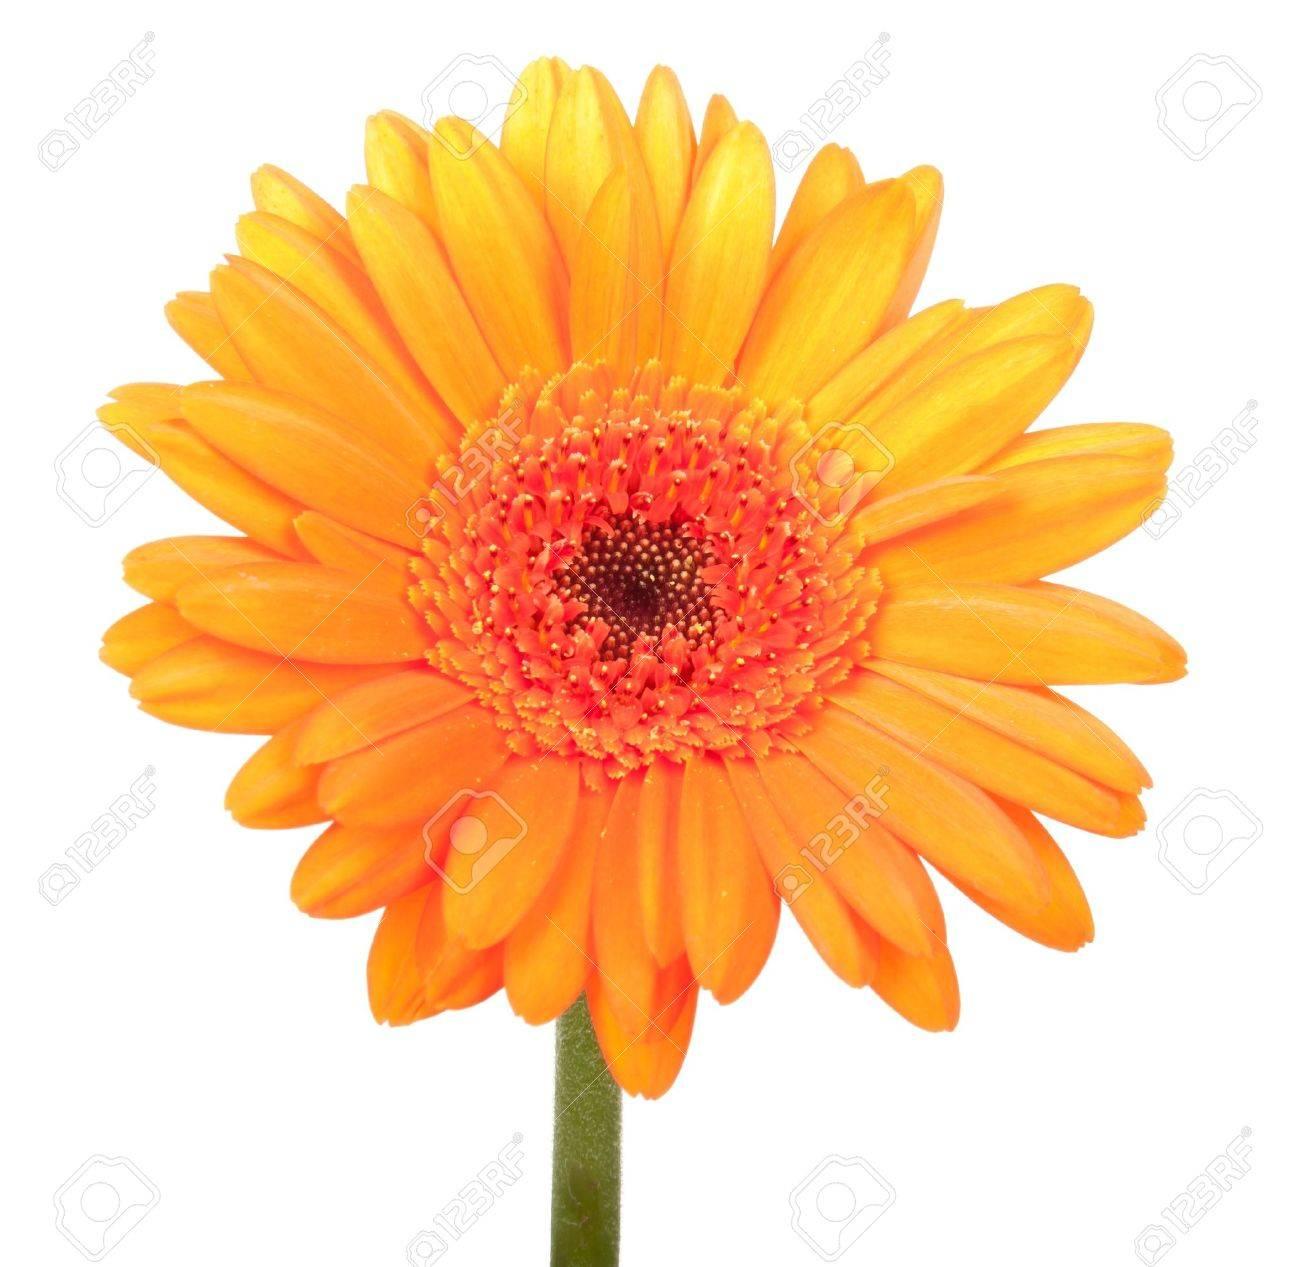 Beautiful orange gerbera, isolated on white - 10341531